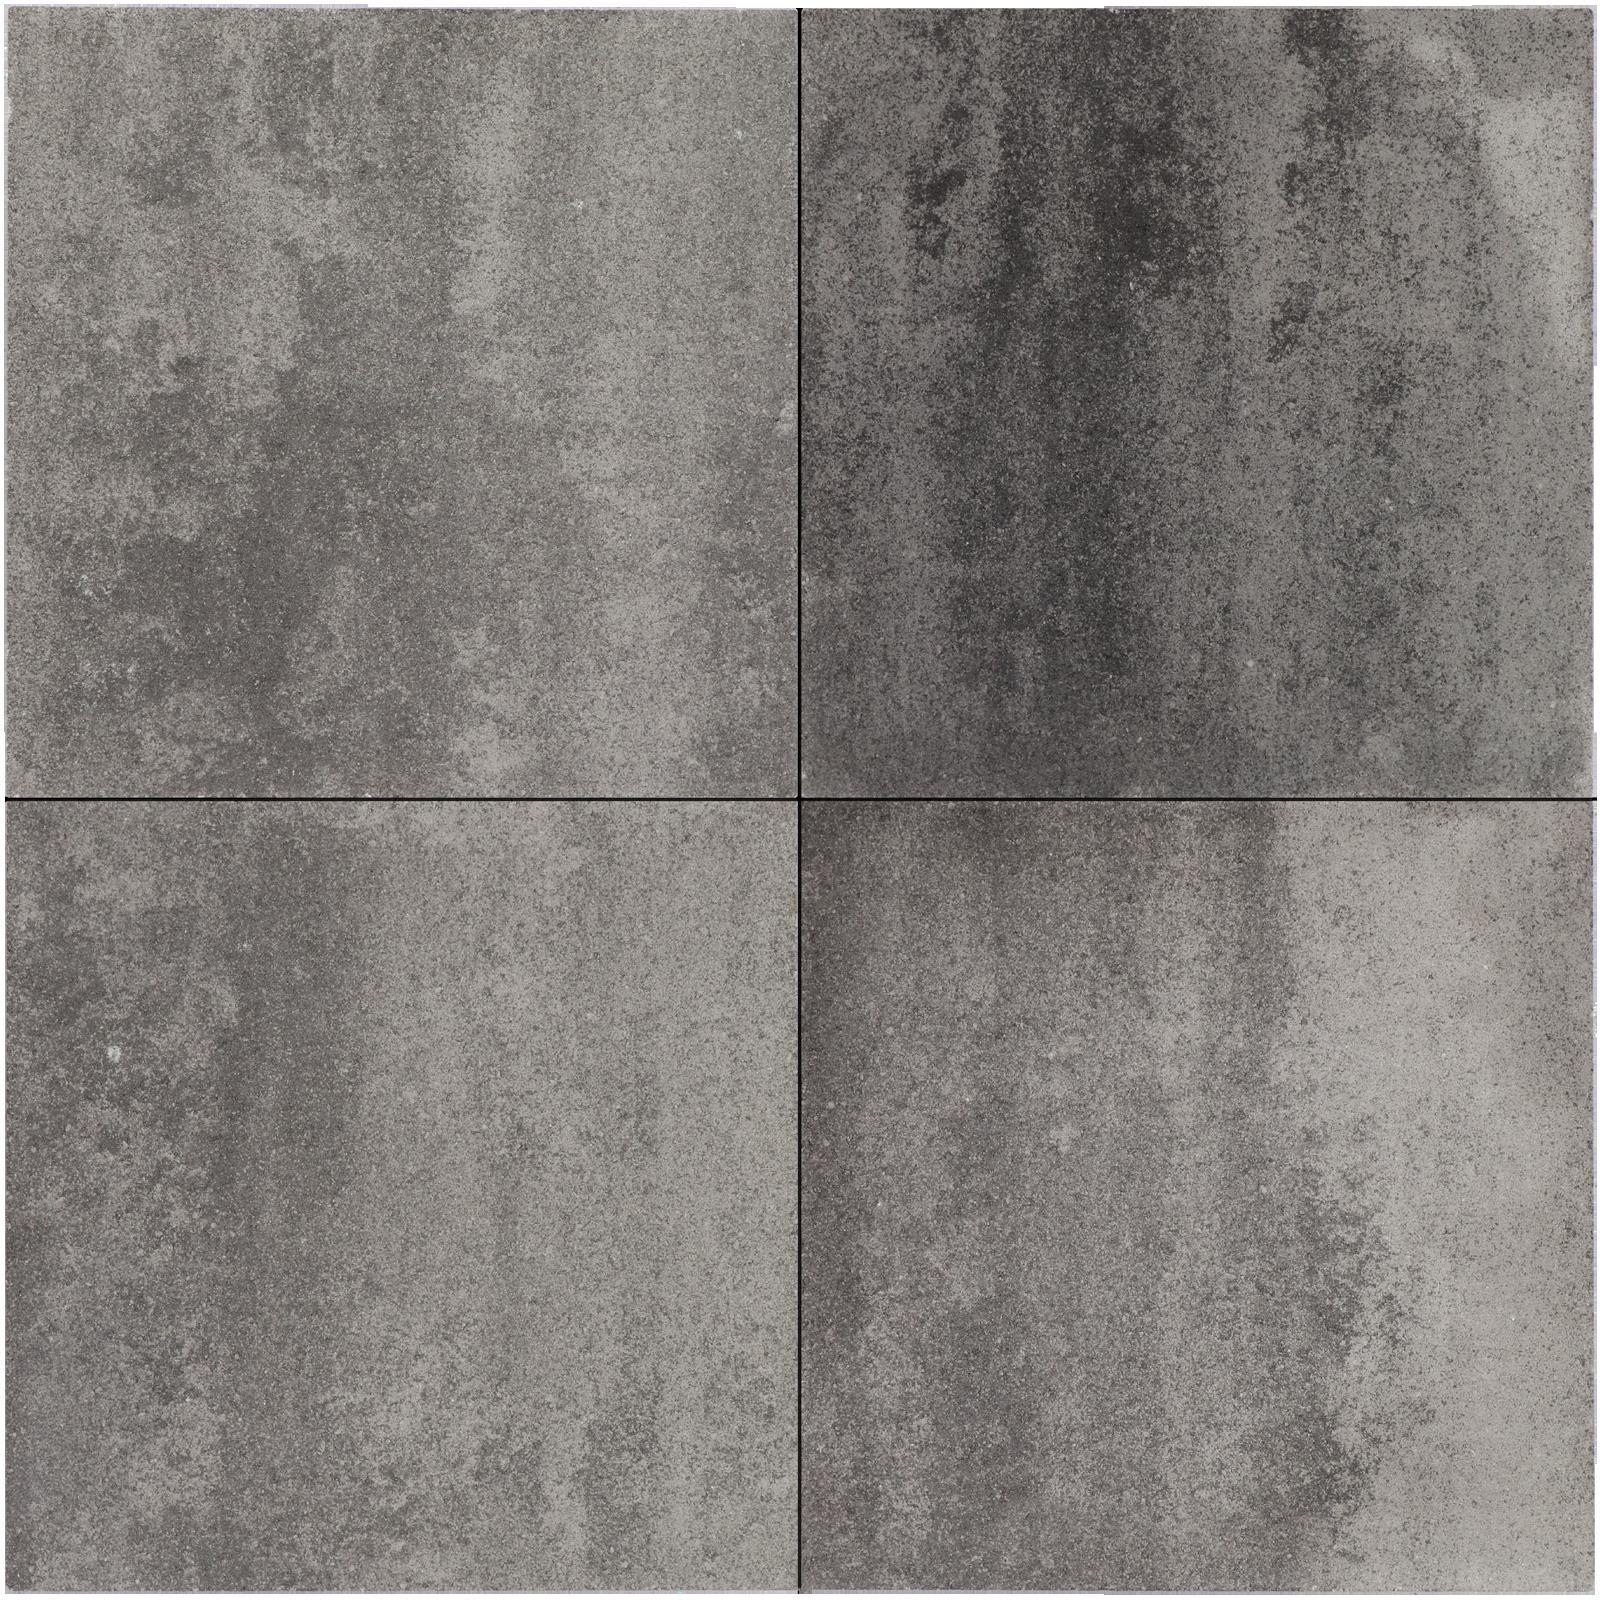 Trento 60x60x4 cm Canar